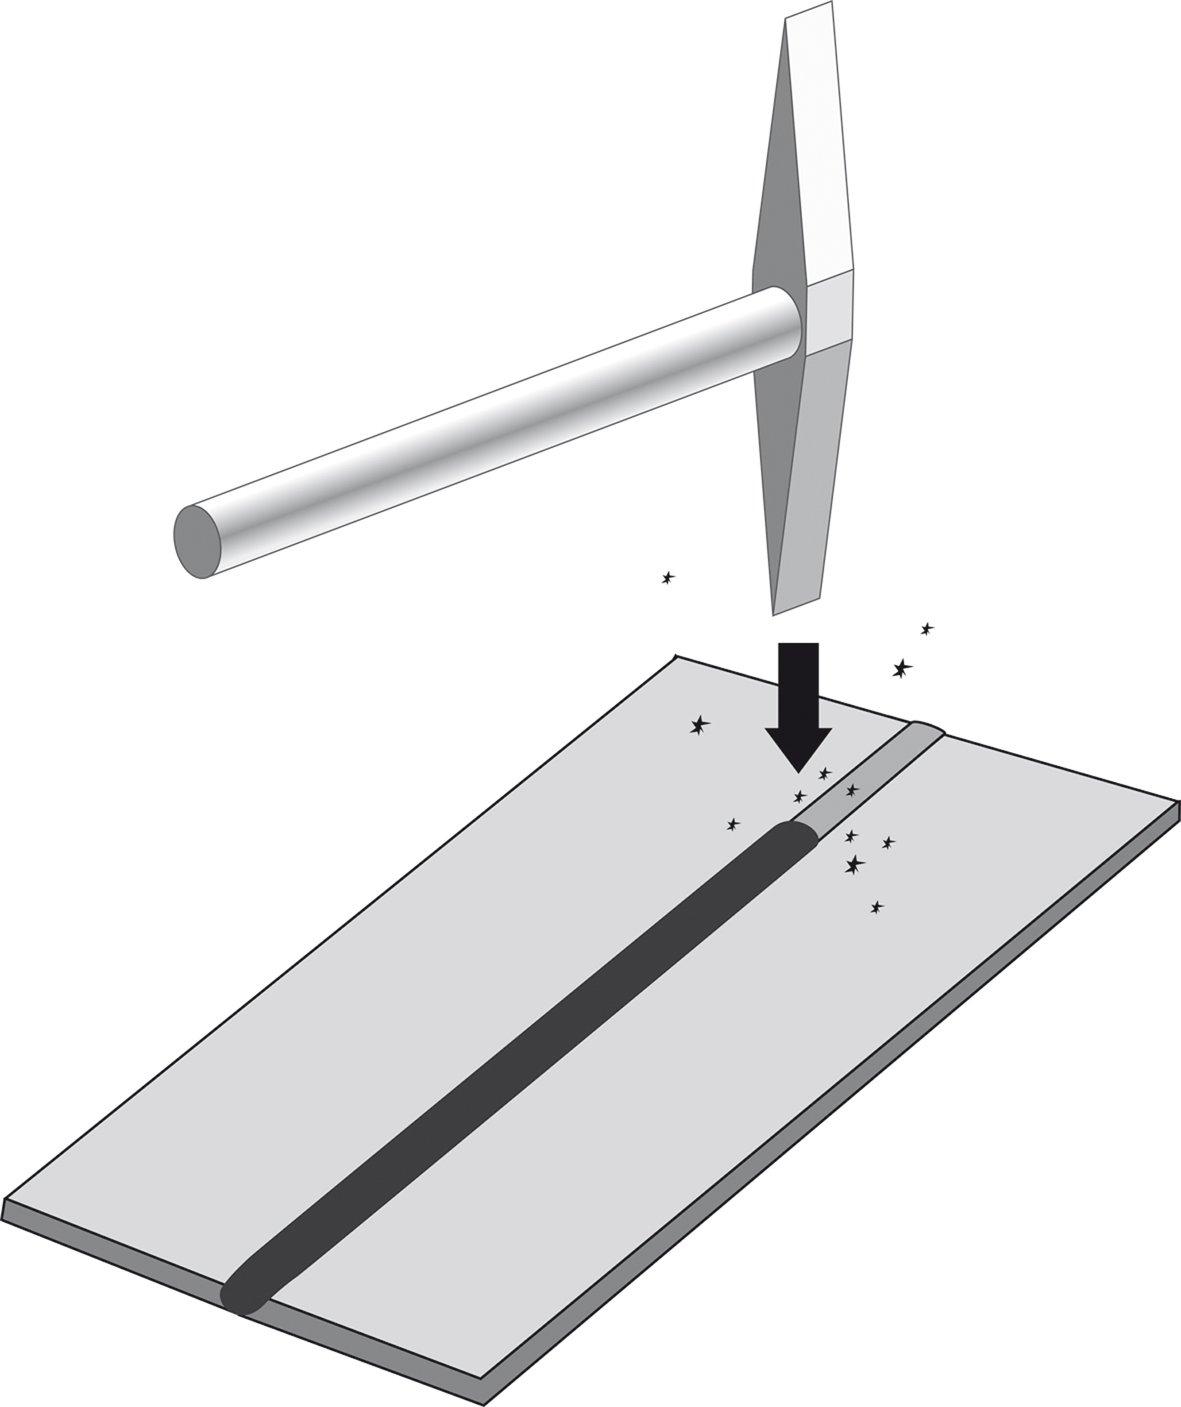 Fartools 150504/Hammer for Welding